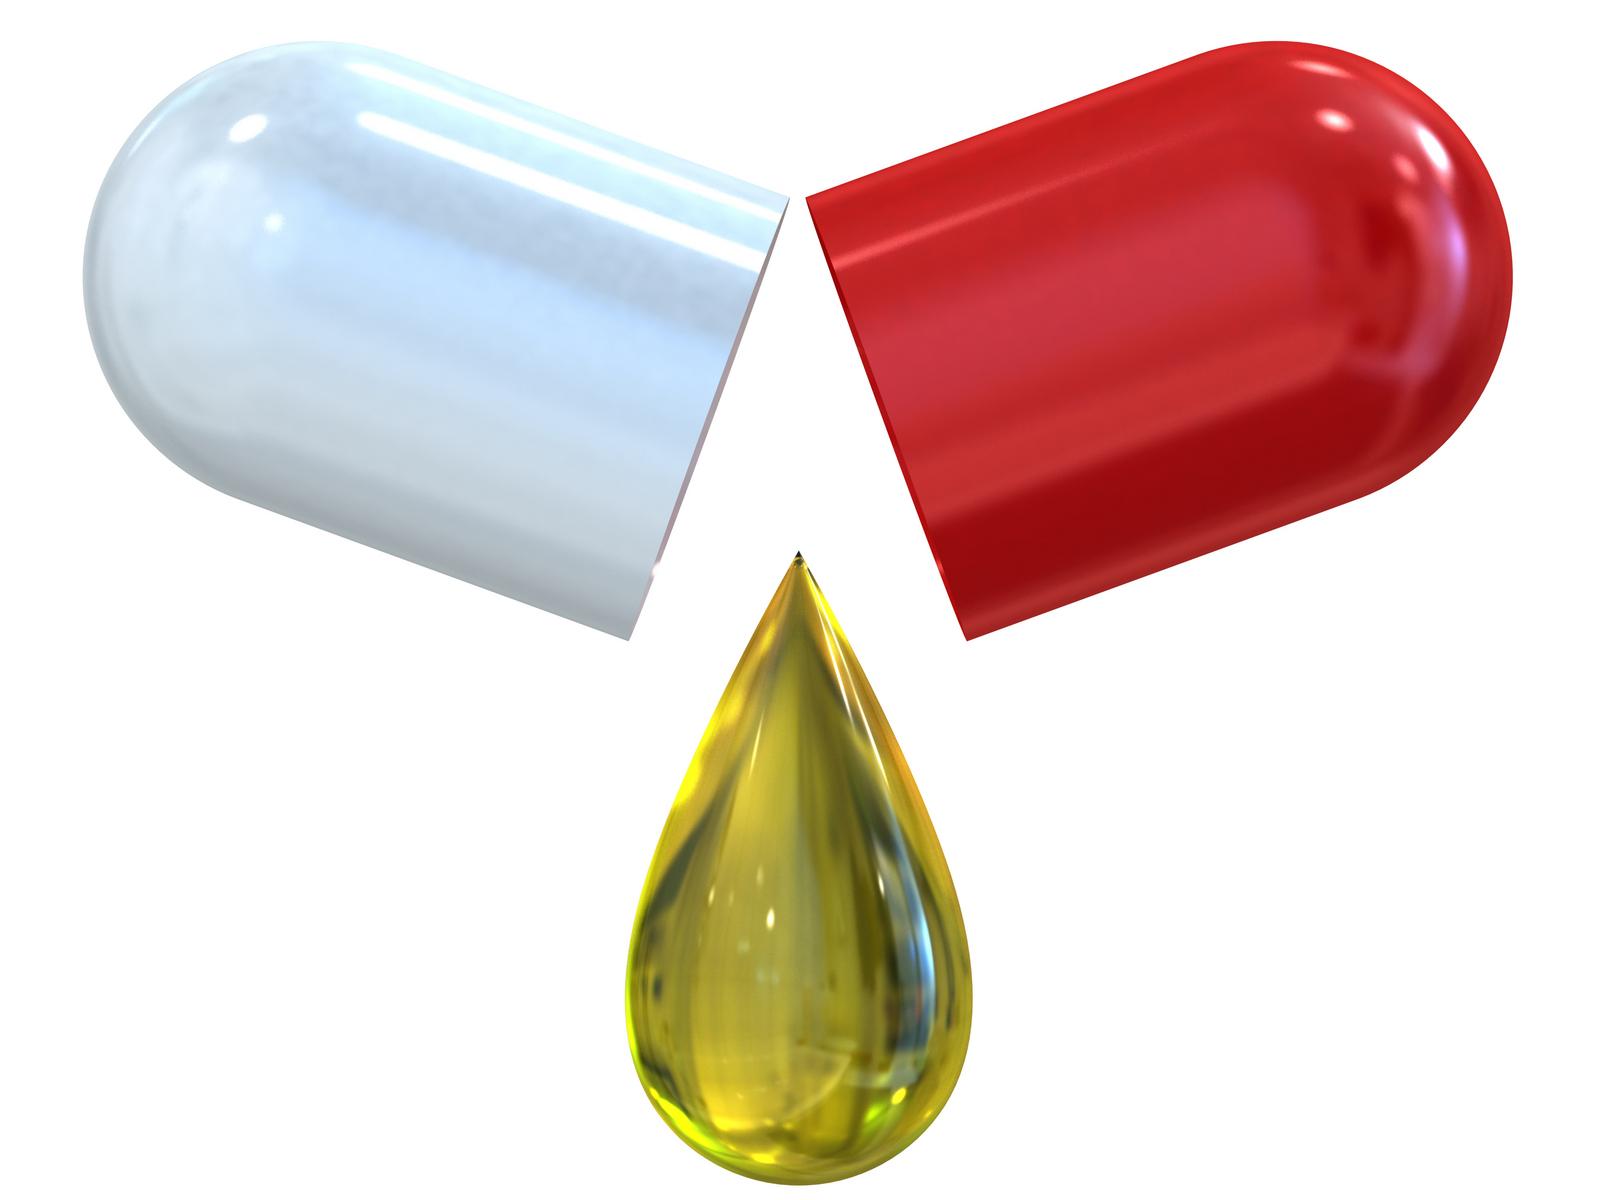 OTC Drugs Medicare PPT Backgrounds